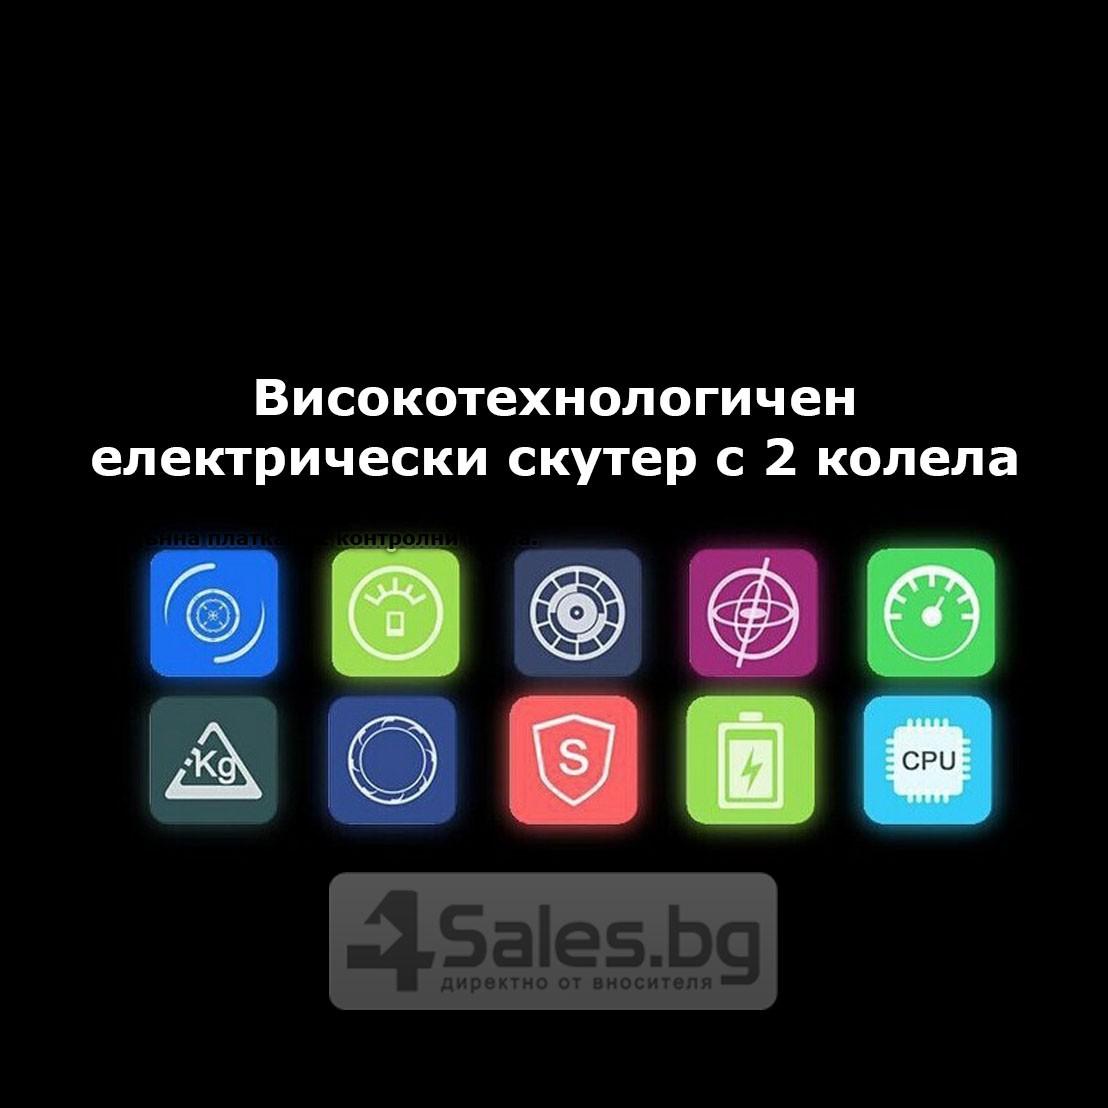 Електрически скейтборд с Bluetooth аудио система iOS и Android 20